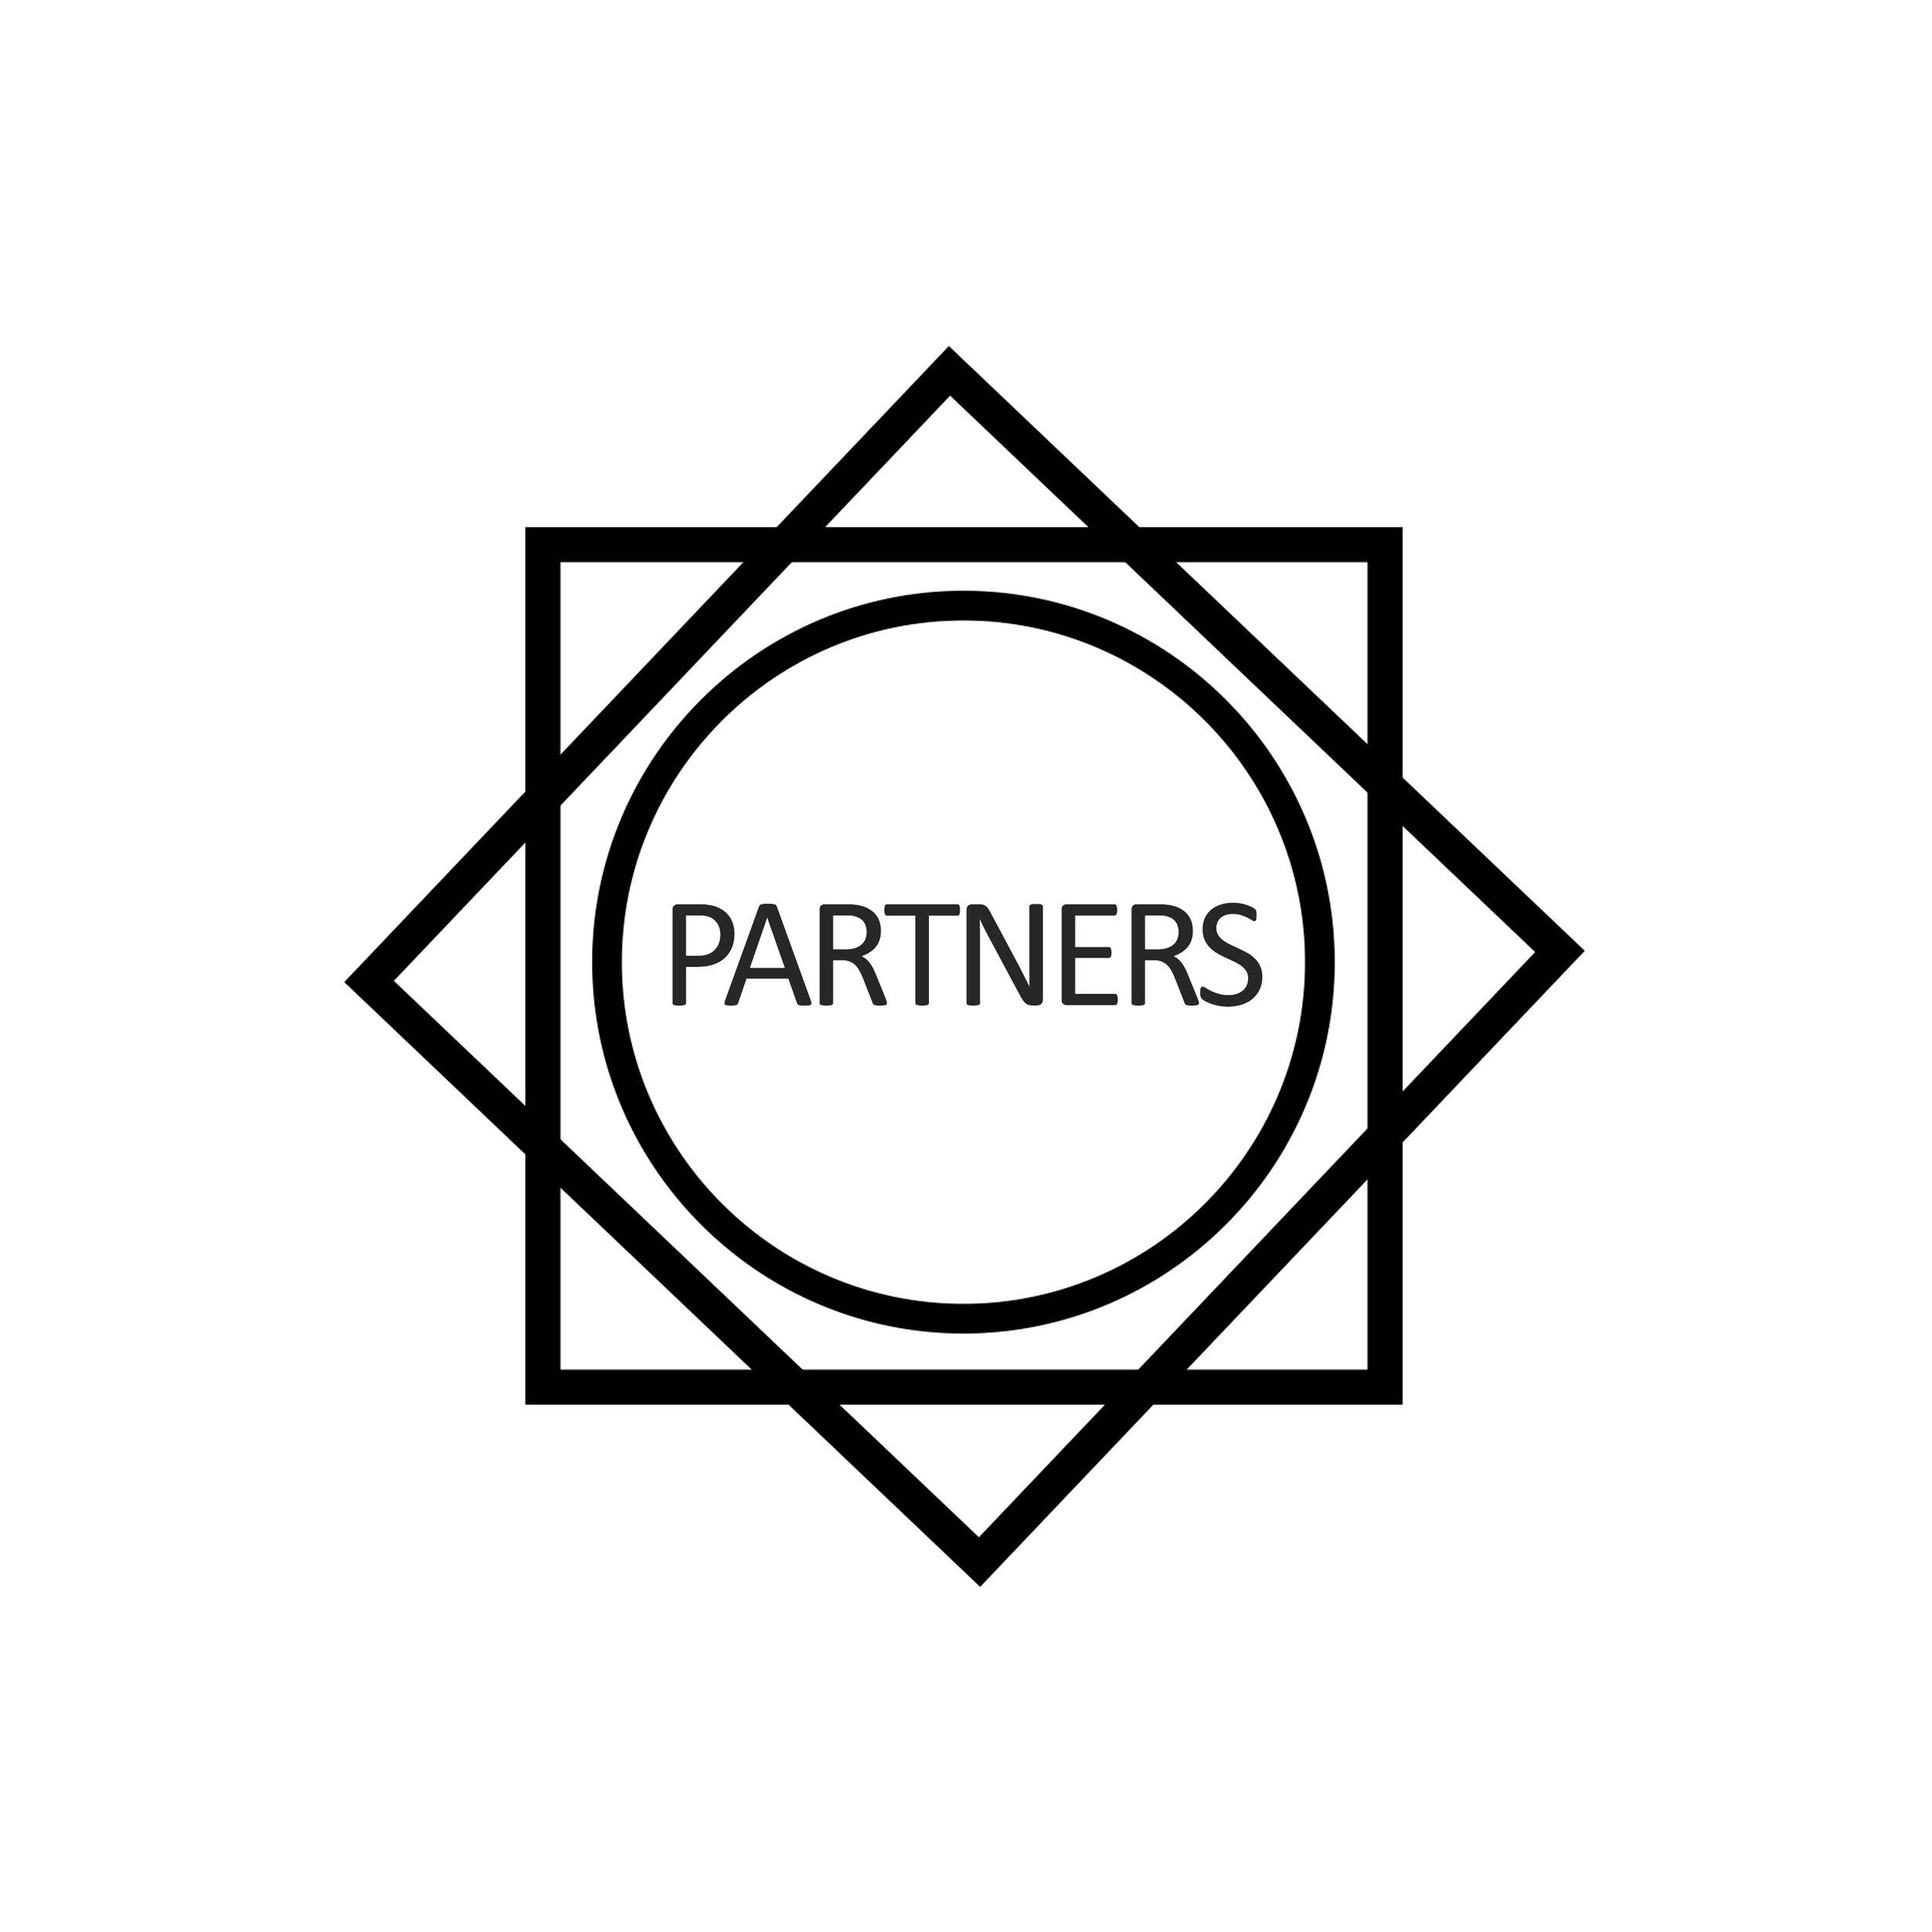 EHFbanner - PARTNERS.jpg